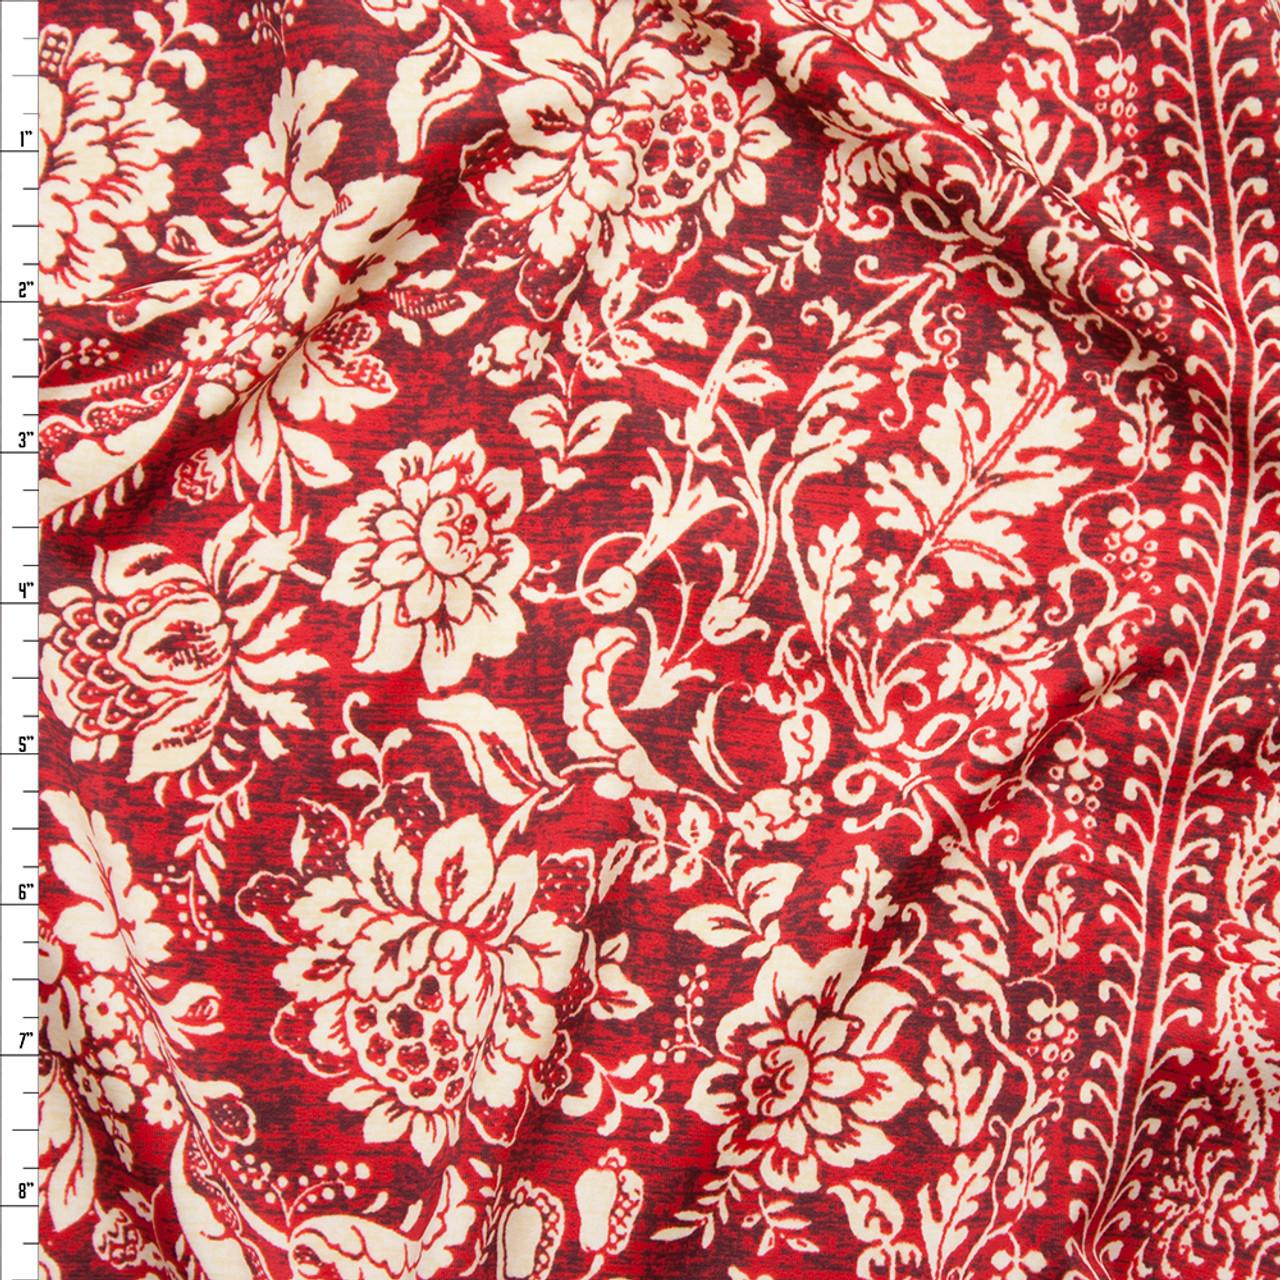 d74789b68a6 Cali Fabrics Tan and Wine Ornate Stripe Spandex Print Fabric by the Yard